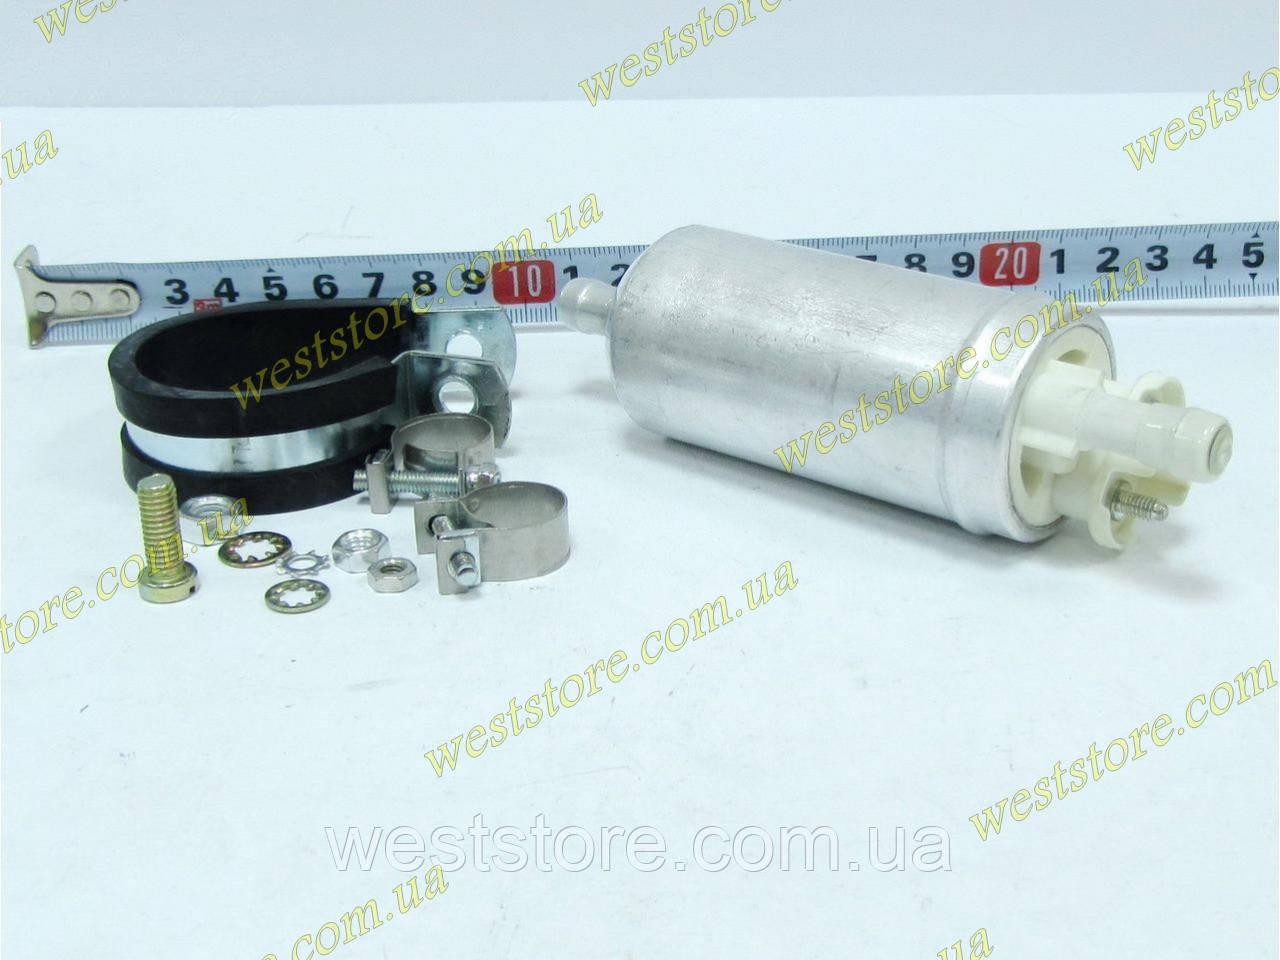 Бензонасос электро низкого давления ваз 2101- 2107, 2108- 2109, заз 1102 1103 таврия славута и т.д. QAP